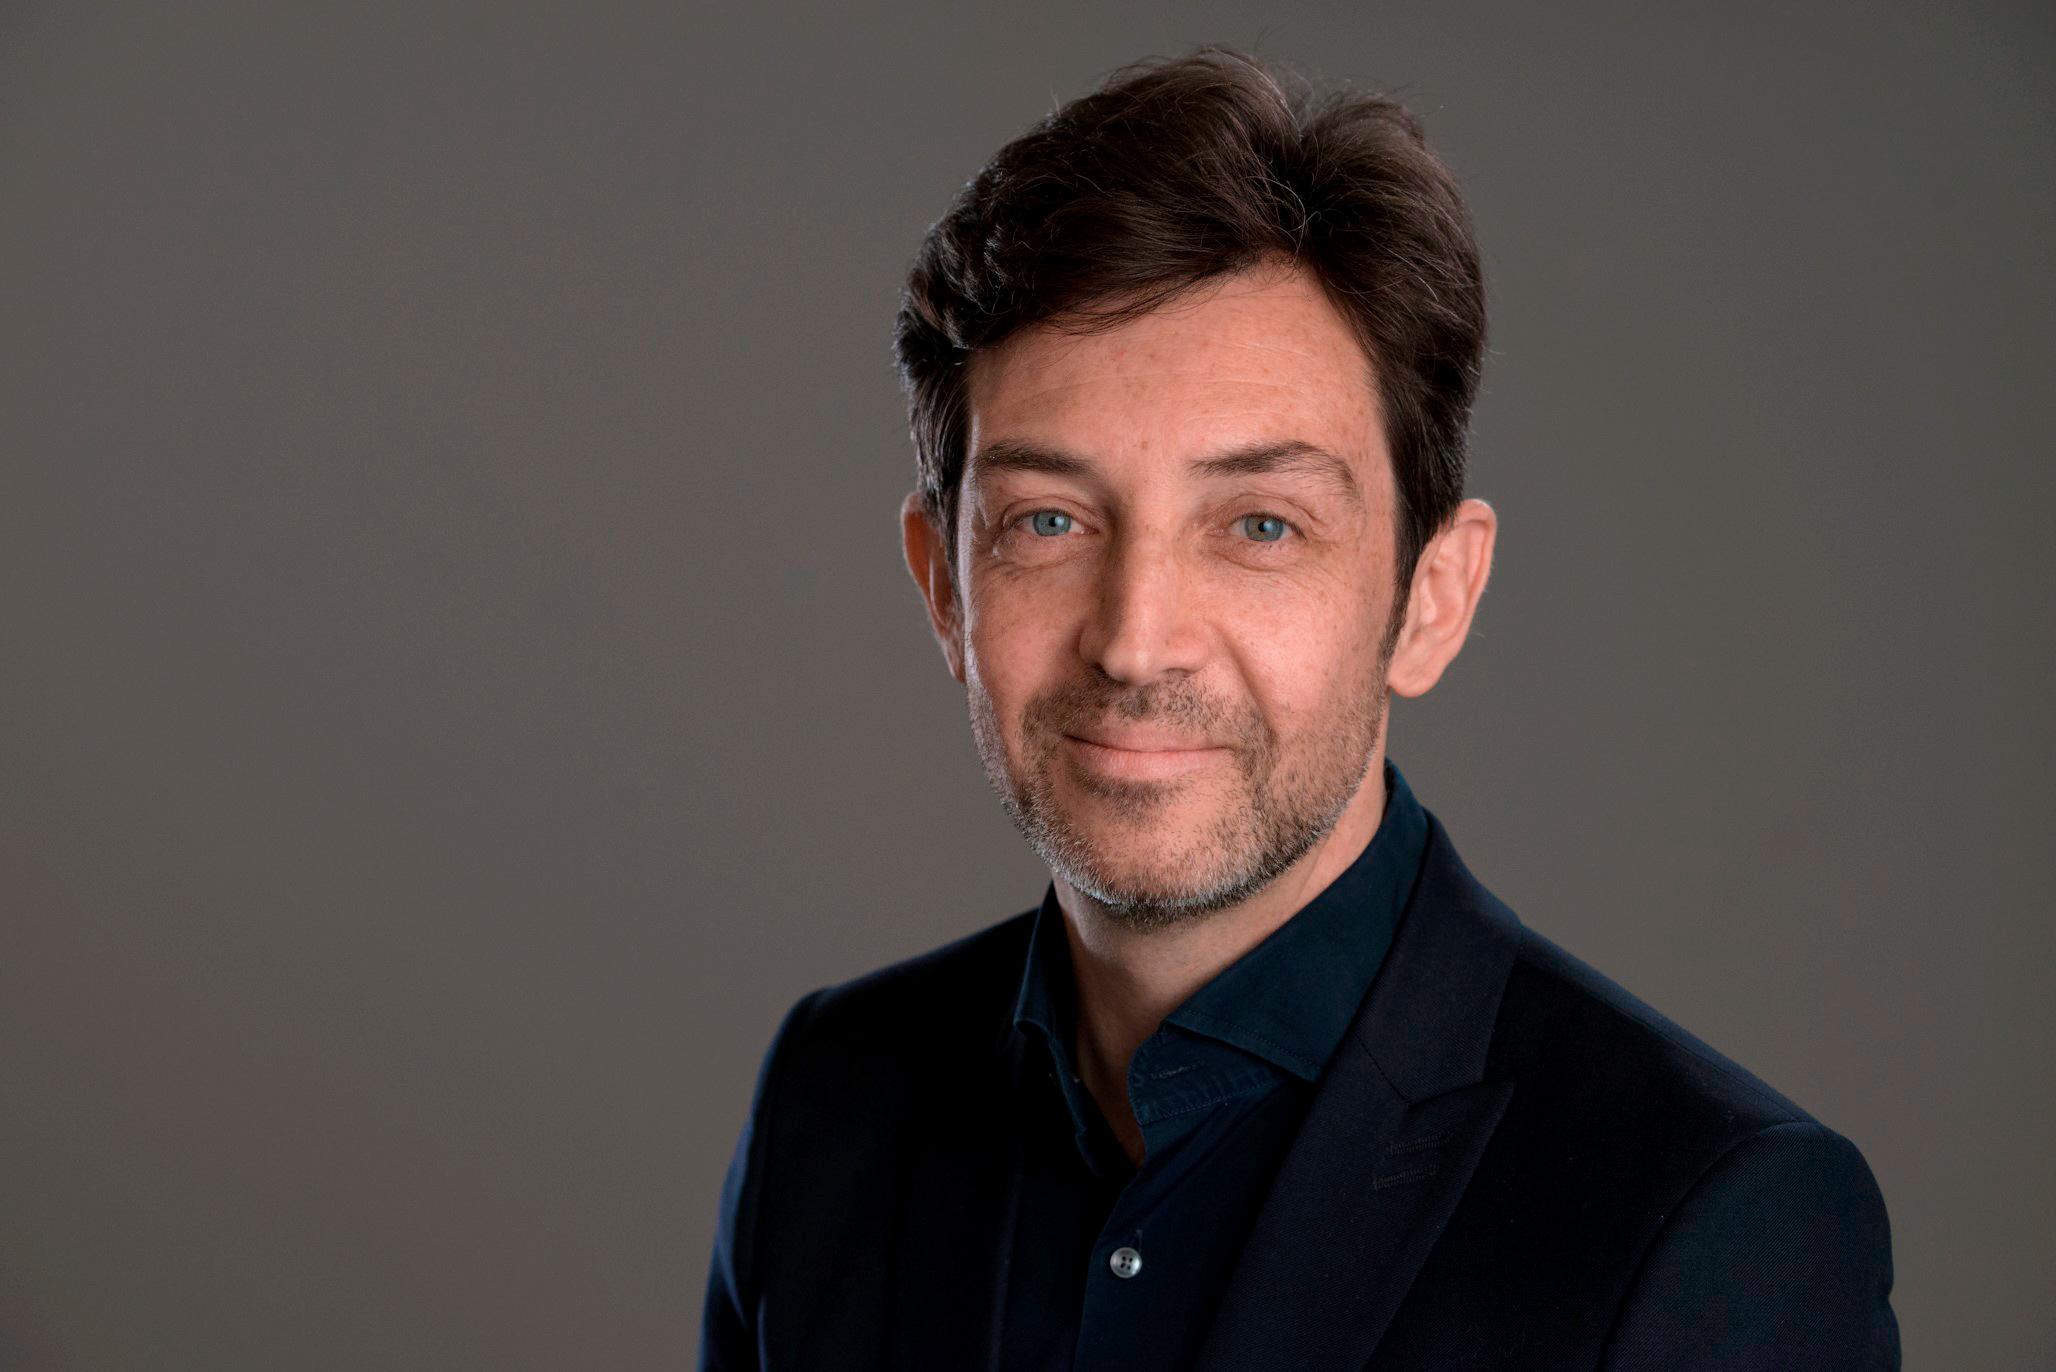 Renaud Sibel, Nouveau Président de Nexway. (Photo: Nexway)